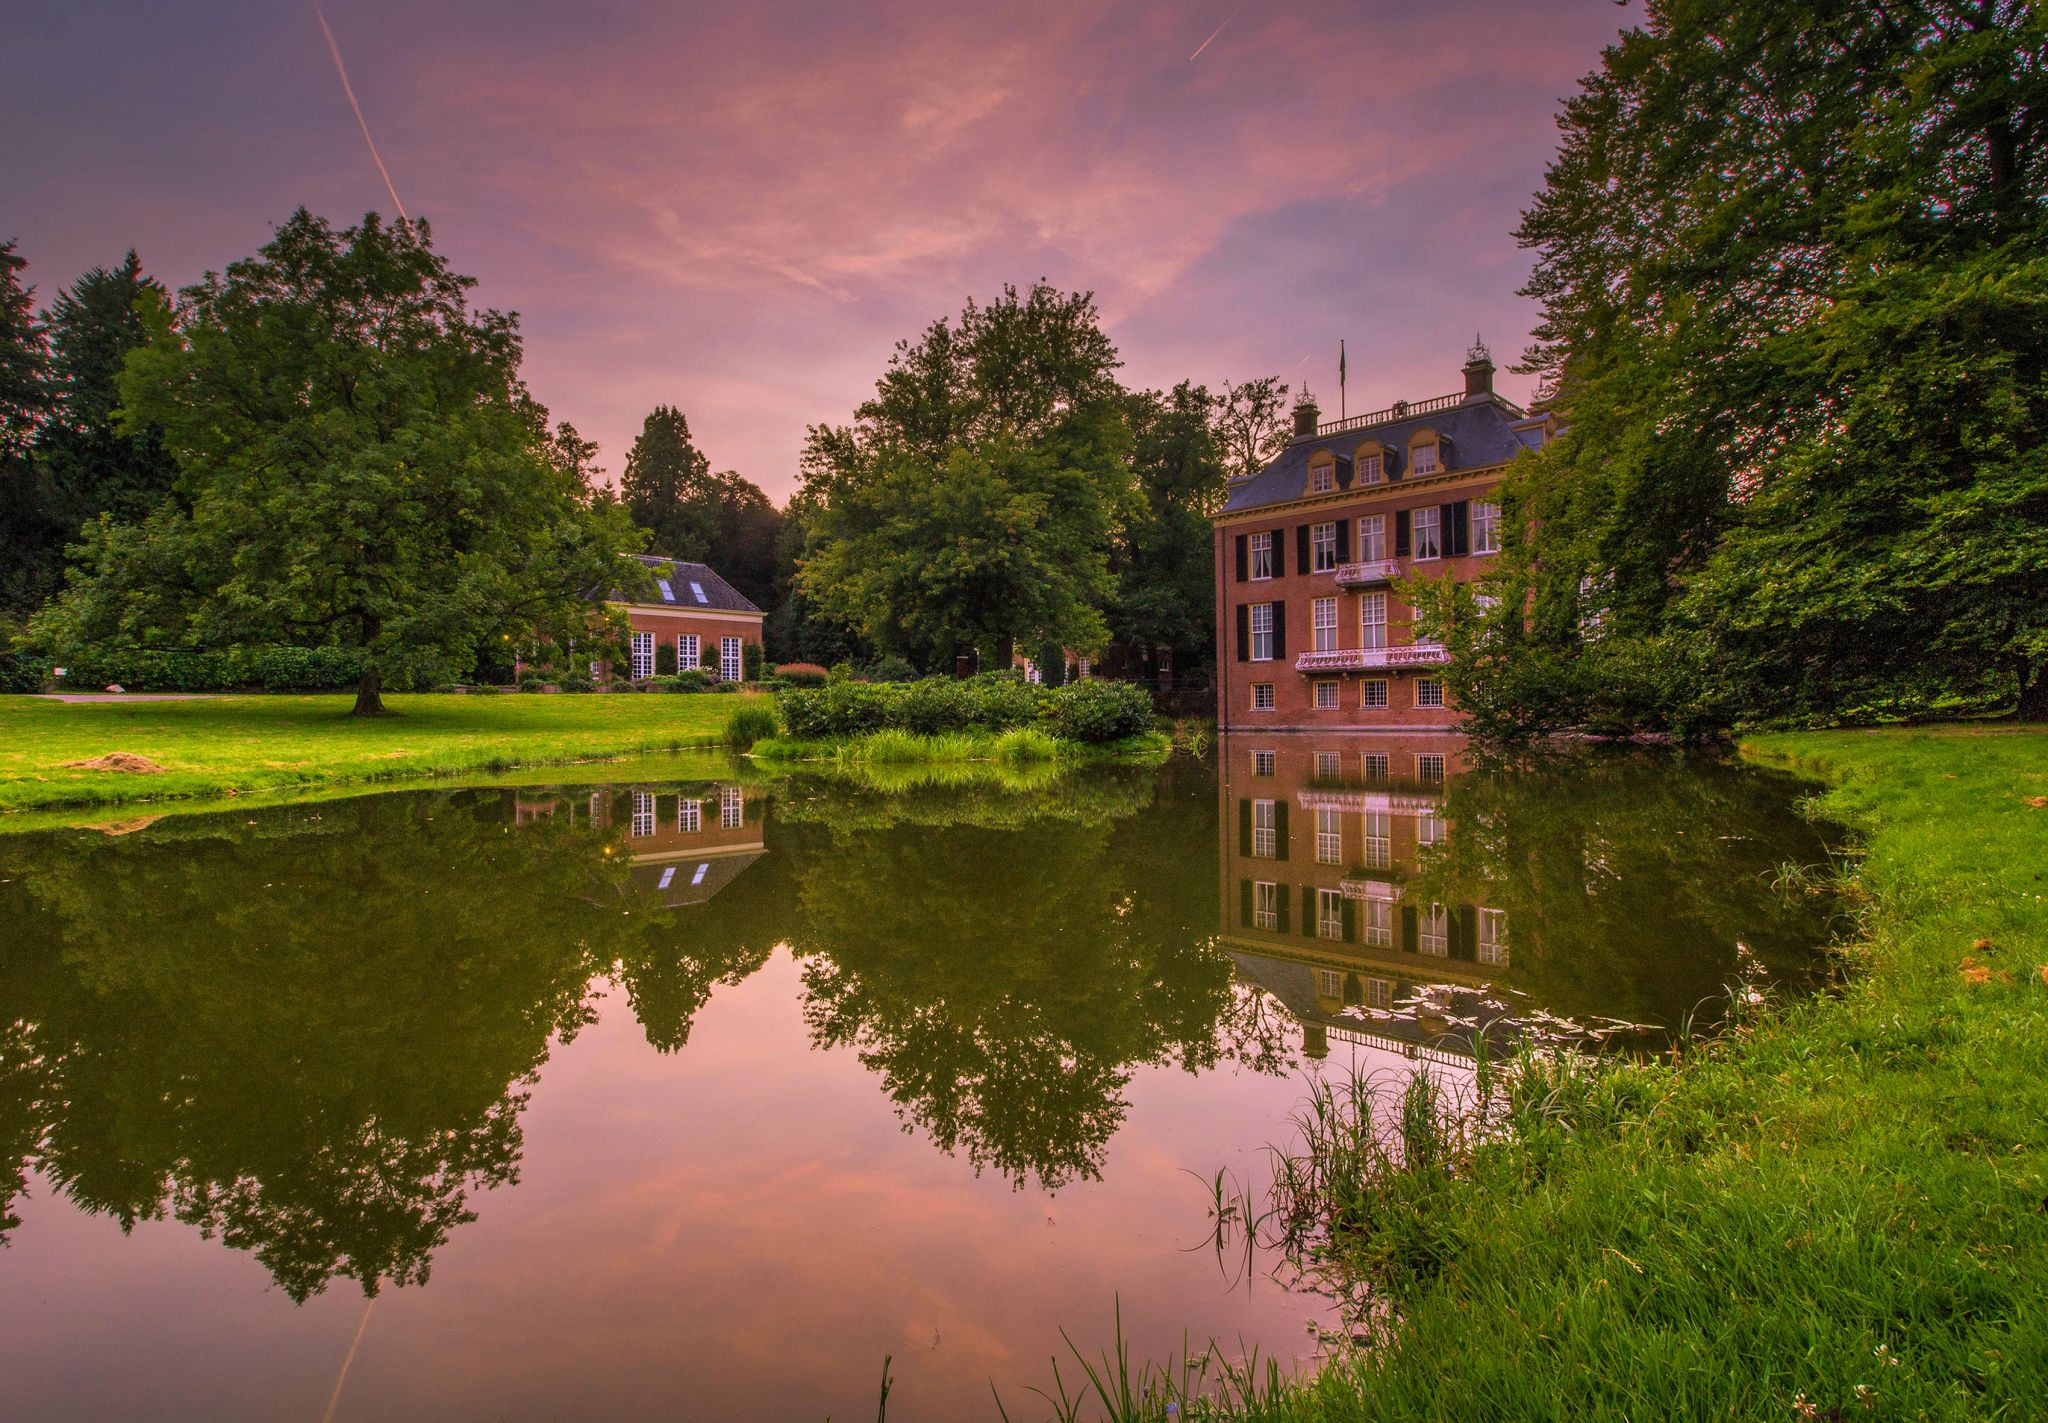 Kasteel Zypendaal, Netherlands